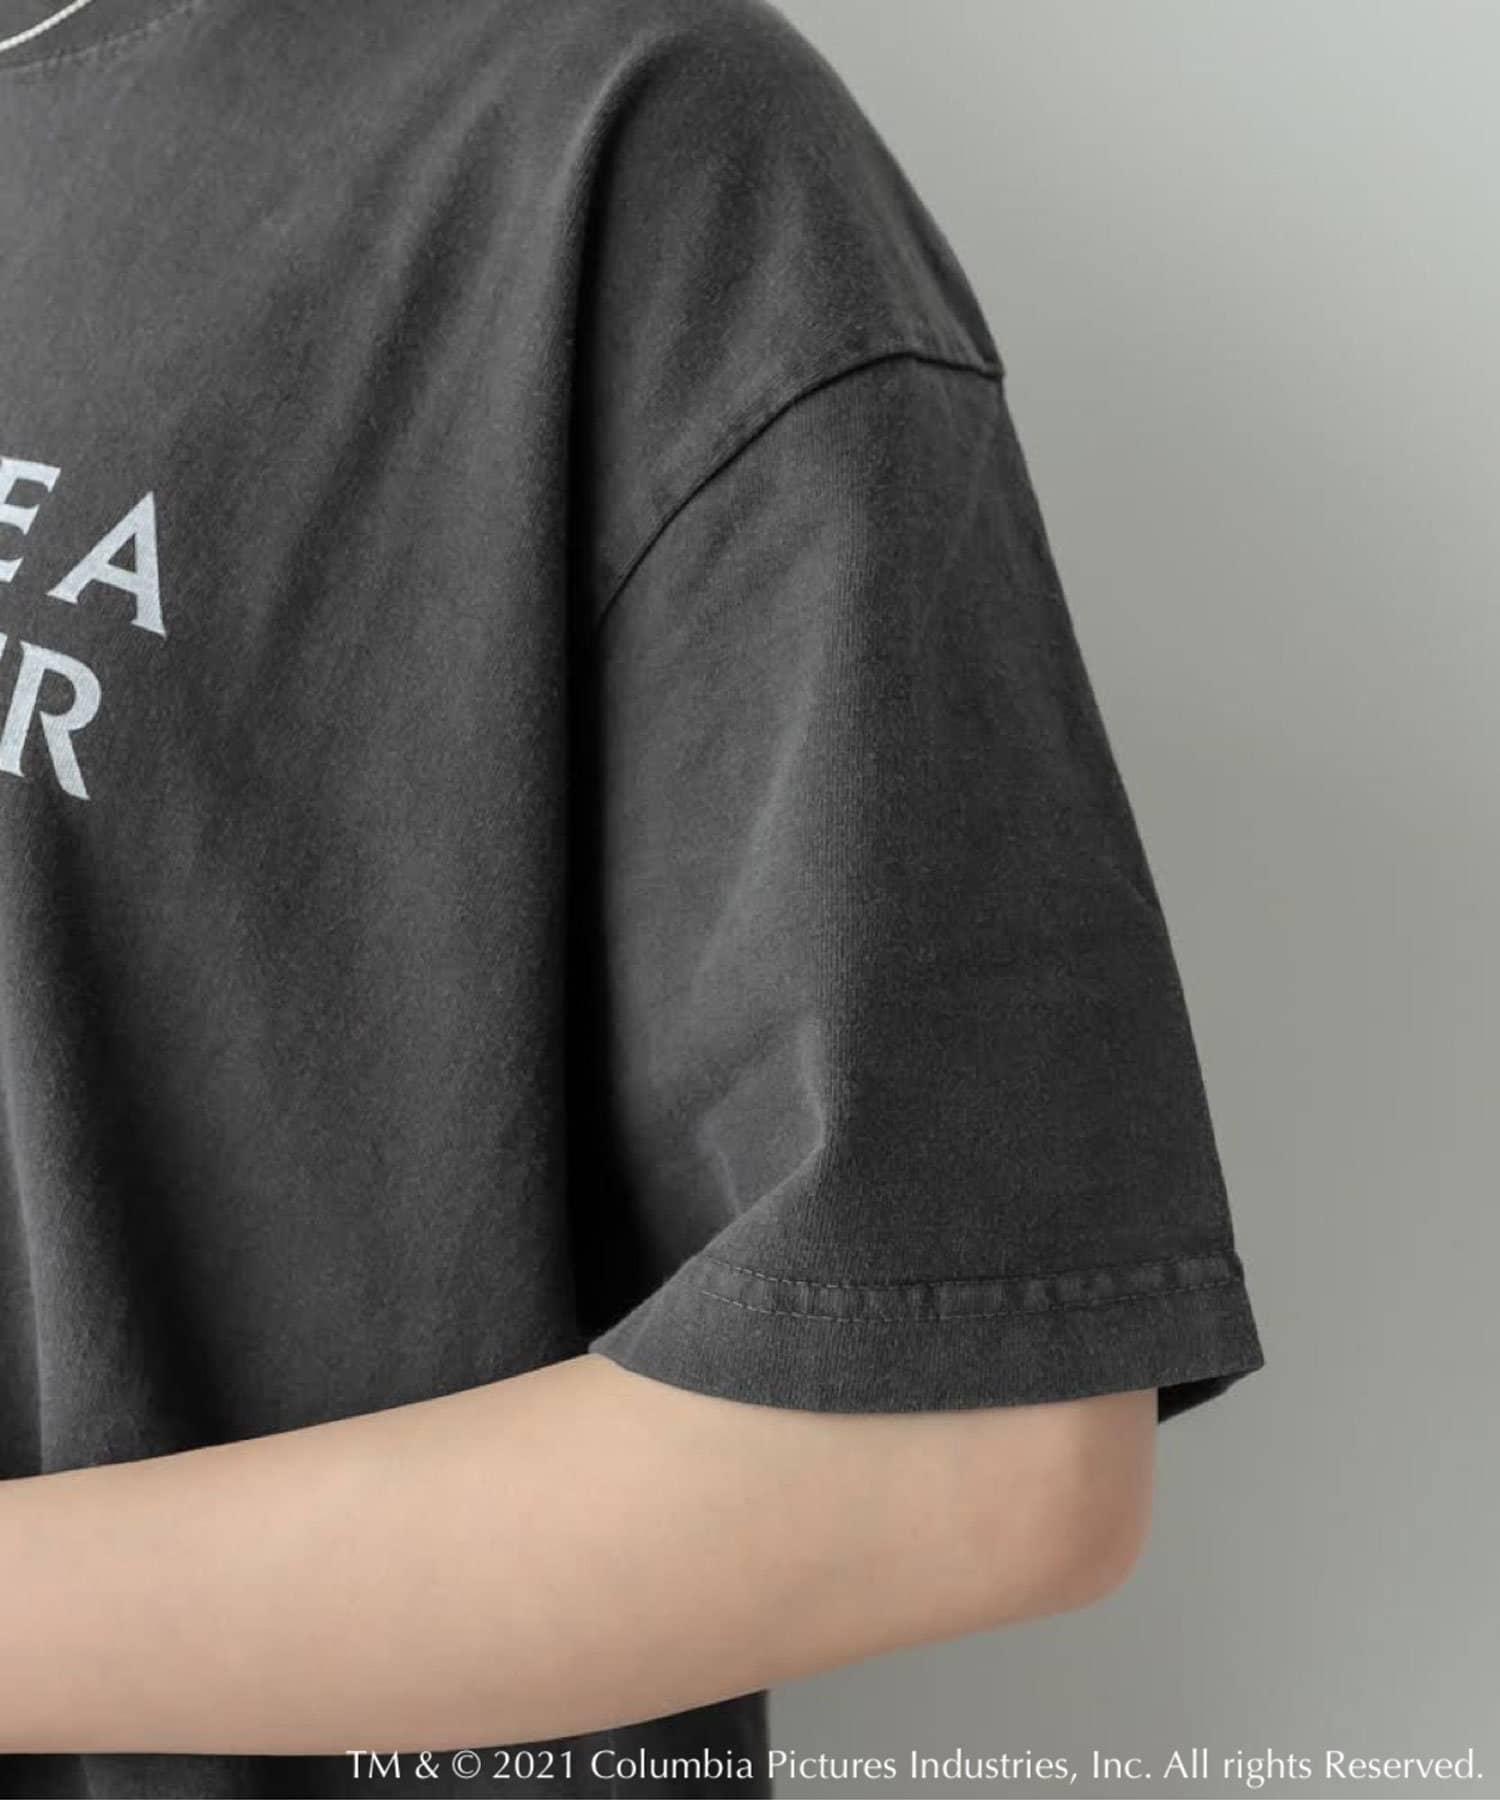 Omekashi(オメカシ) GHOSTBUSTERS Tシャツ